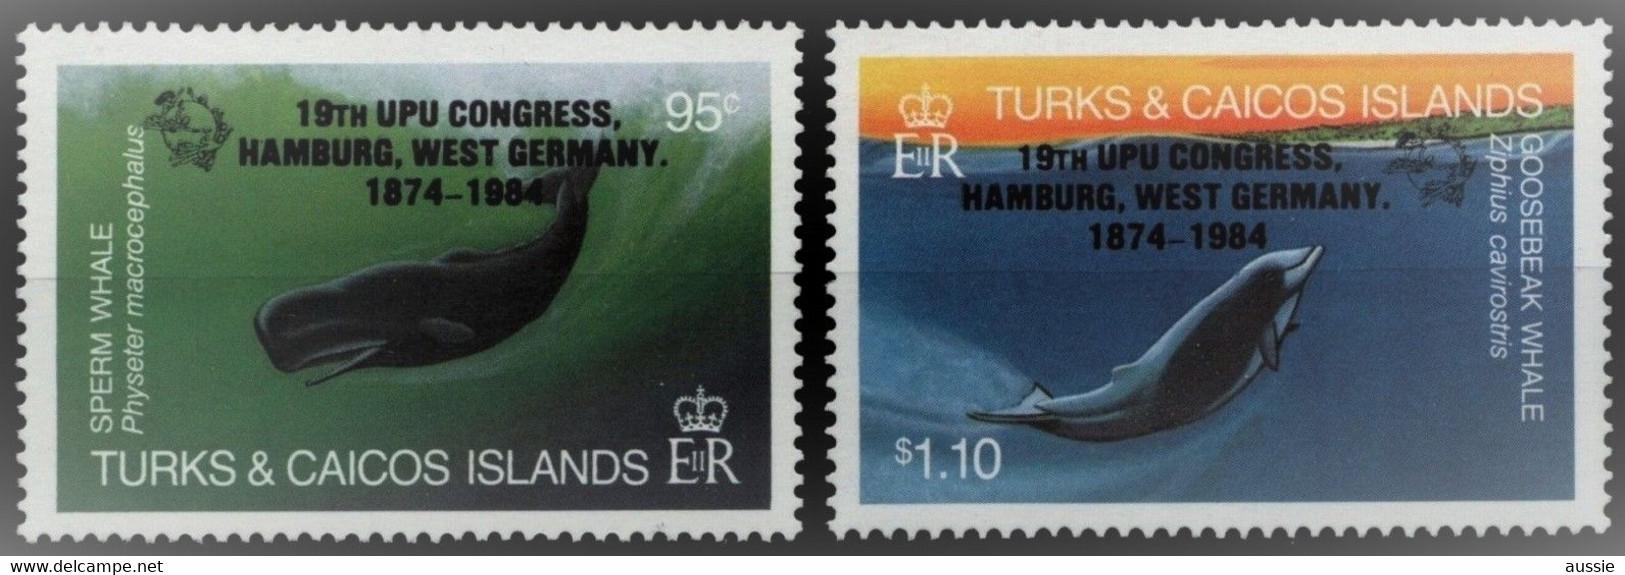 Turcs Caicos Turks Et Caiques 1984 Yvertn° 695-696 *** MNH Cote 9 € Faune Marine UPU Hamburg - Turks & Caicos